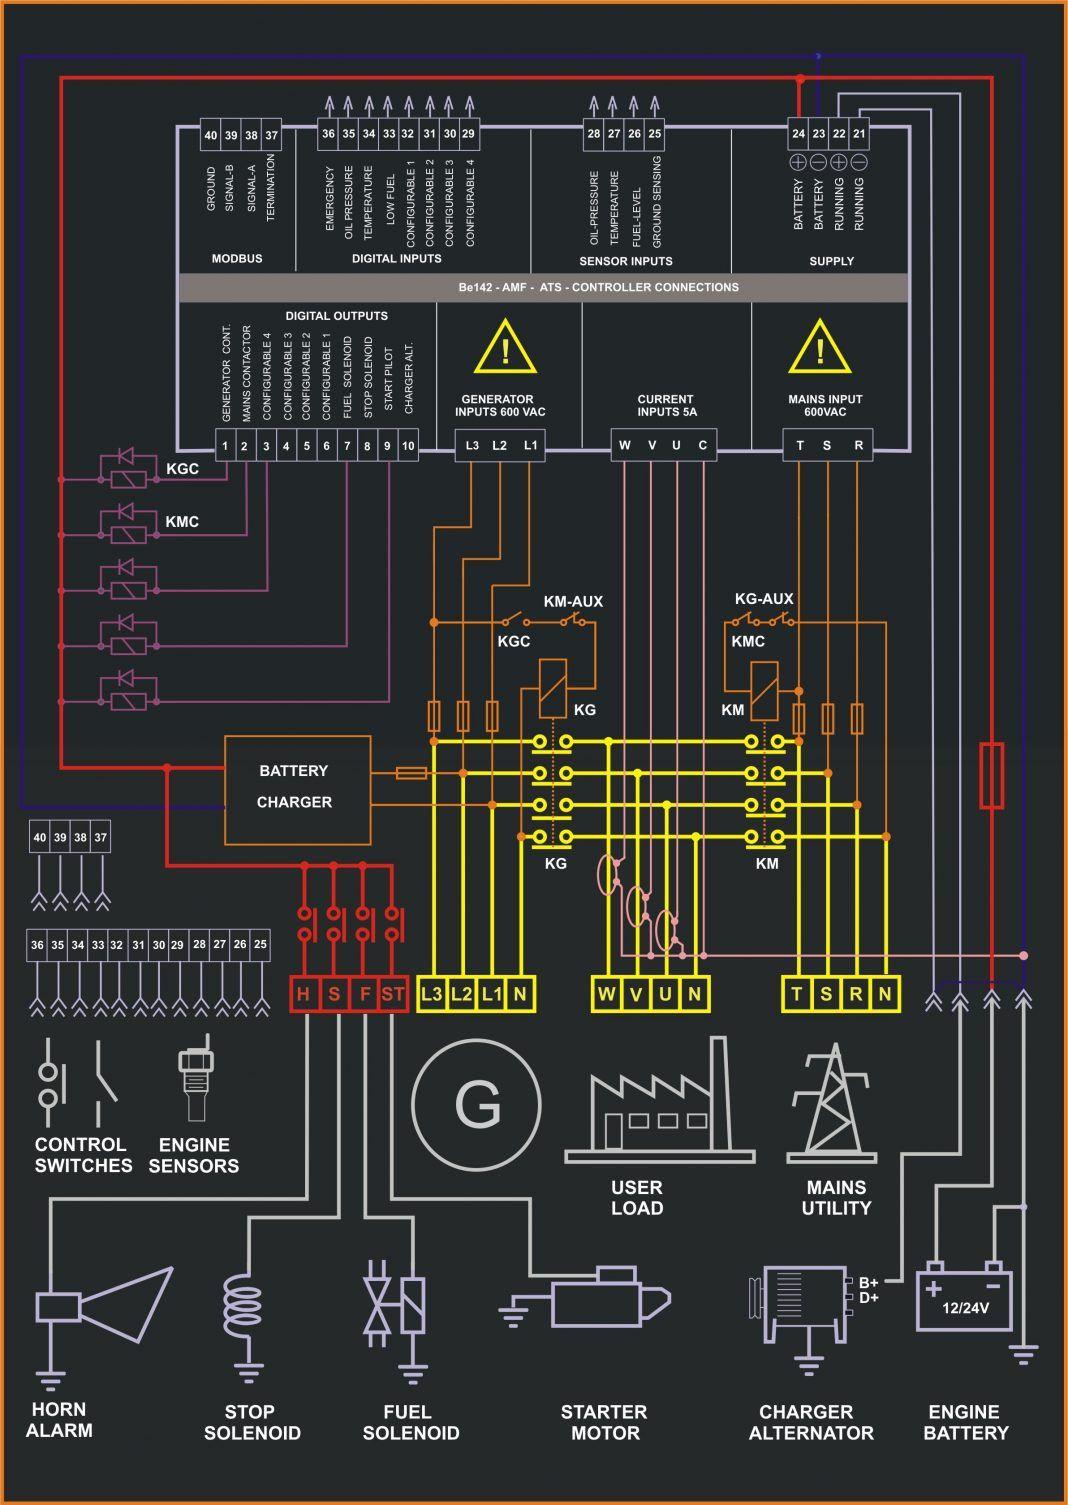 7 Complex Plc Panel Wiring Diagram Samples Bacamajalah Electrical Circuit Diagram Circuit Diagram Electrical Panel Wiring